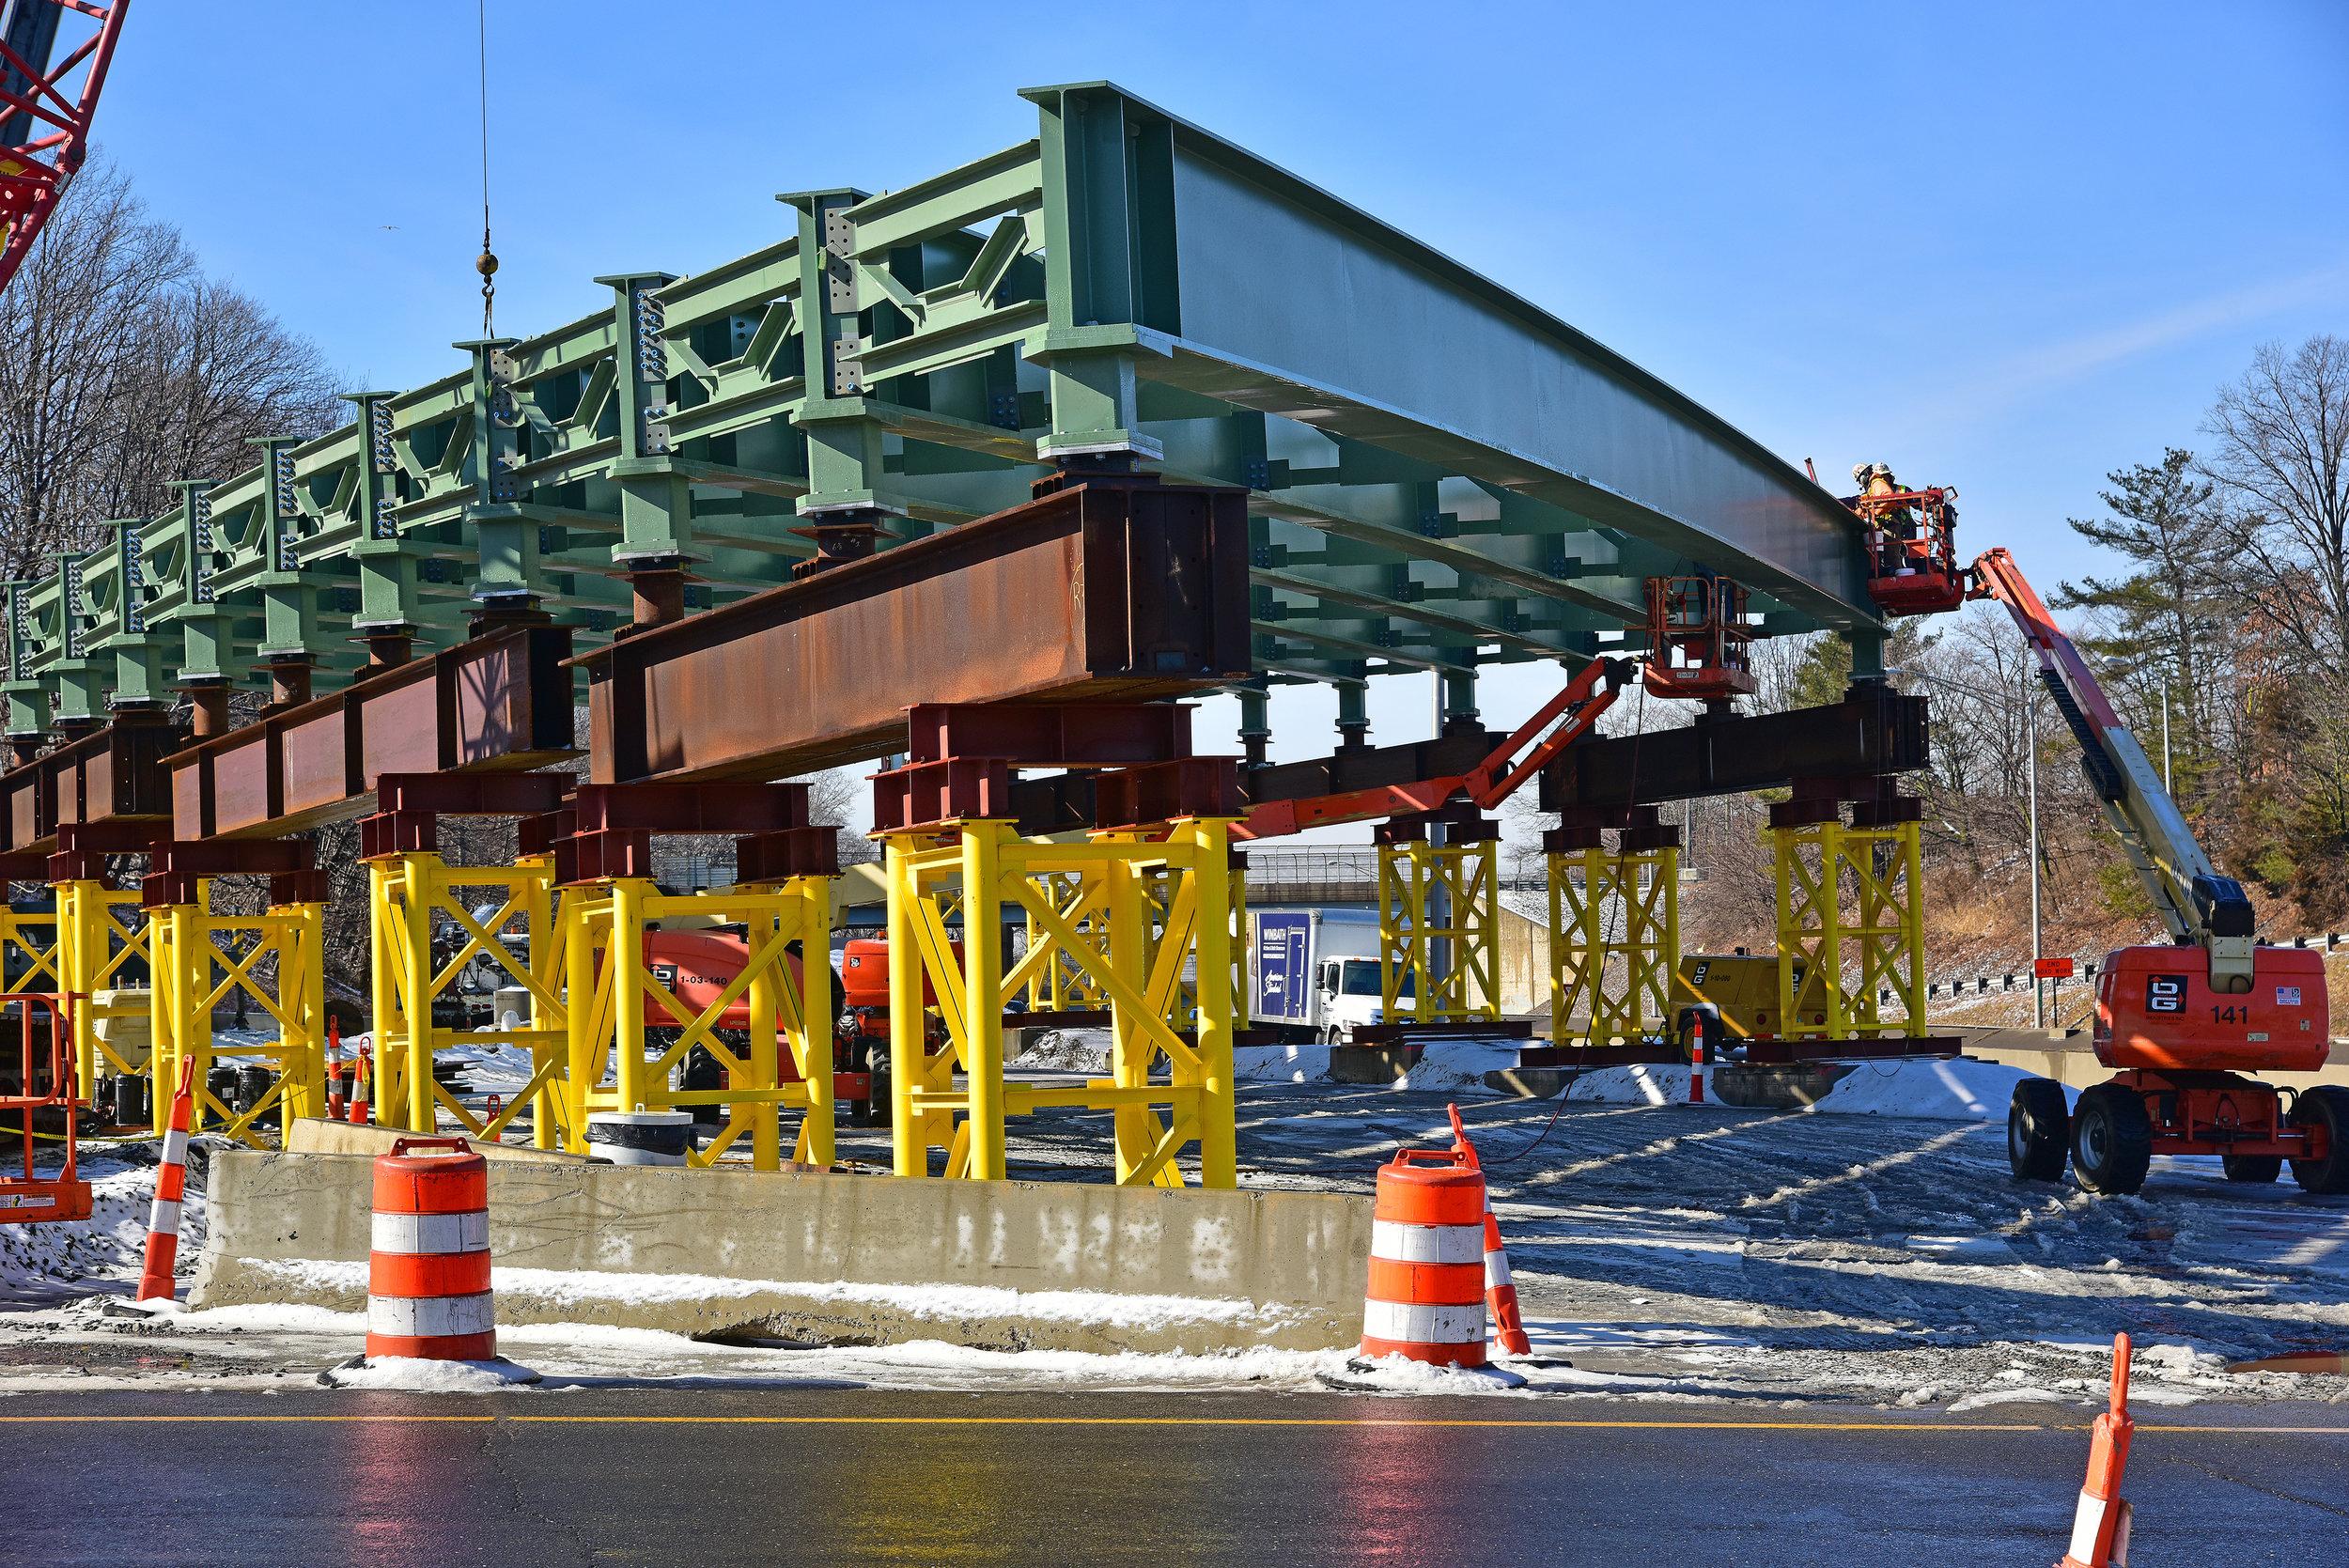 Bridge Span 2 taking shape.  Taken on 2/19 by Seth Duke